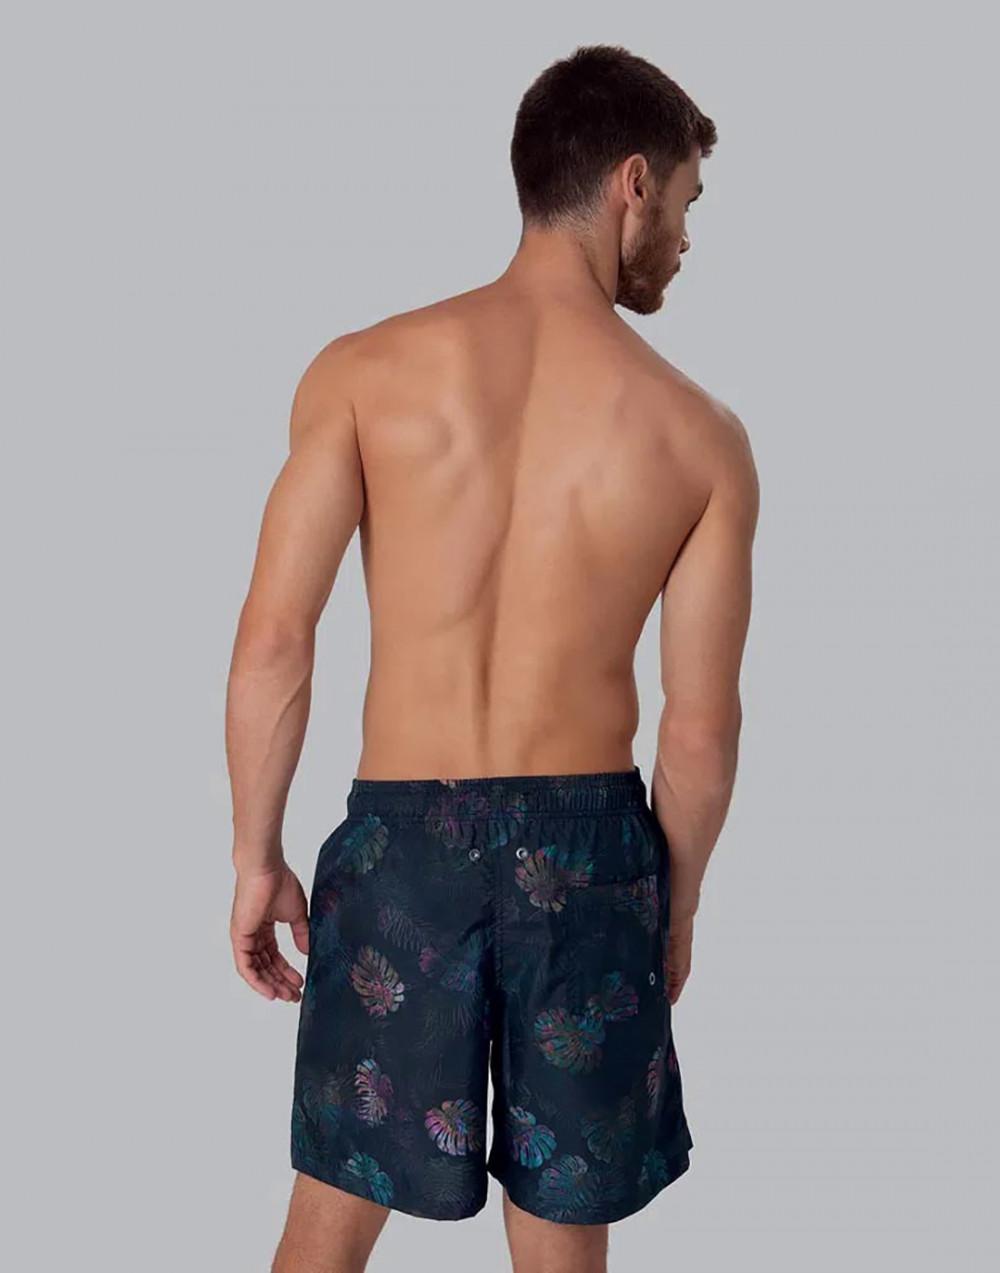 Shorts Estampado Folhagem FPS 30 Preto Mash